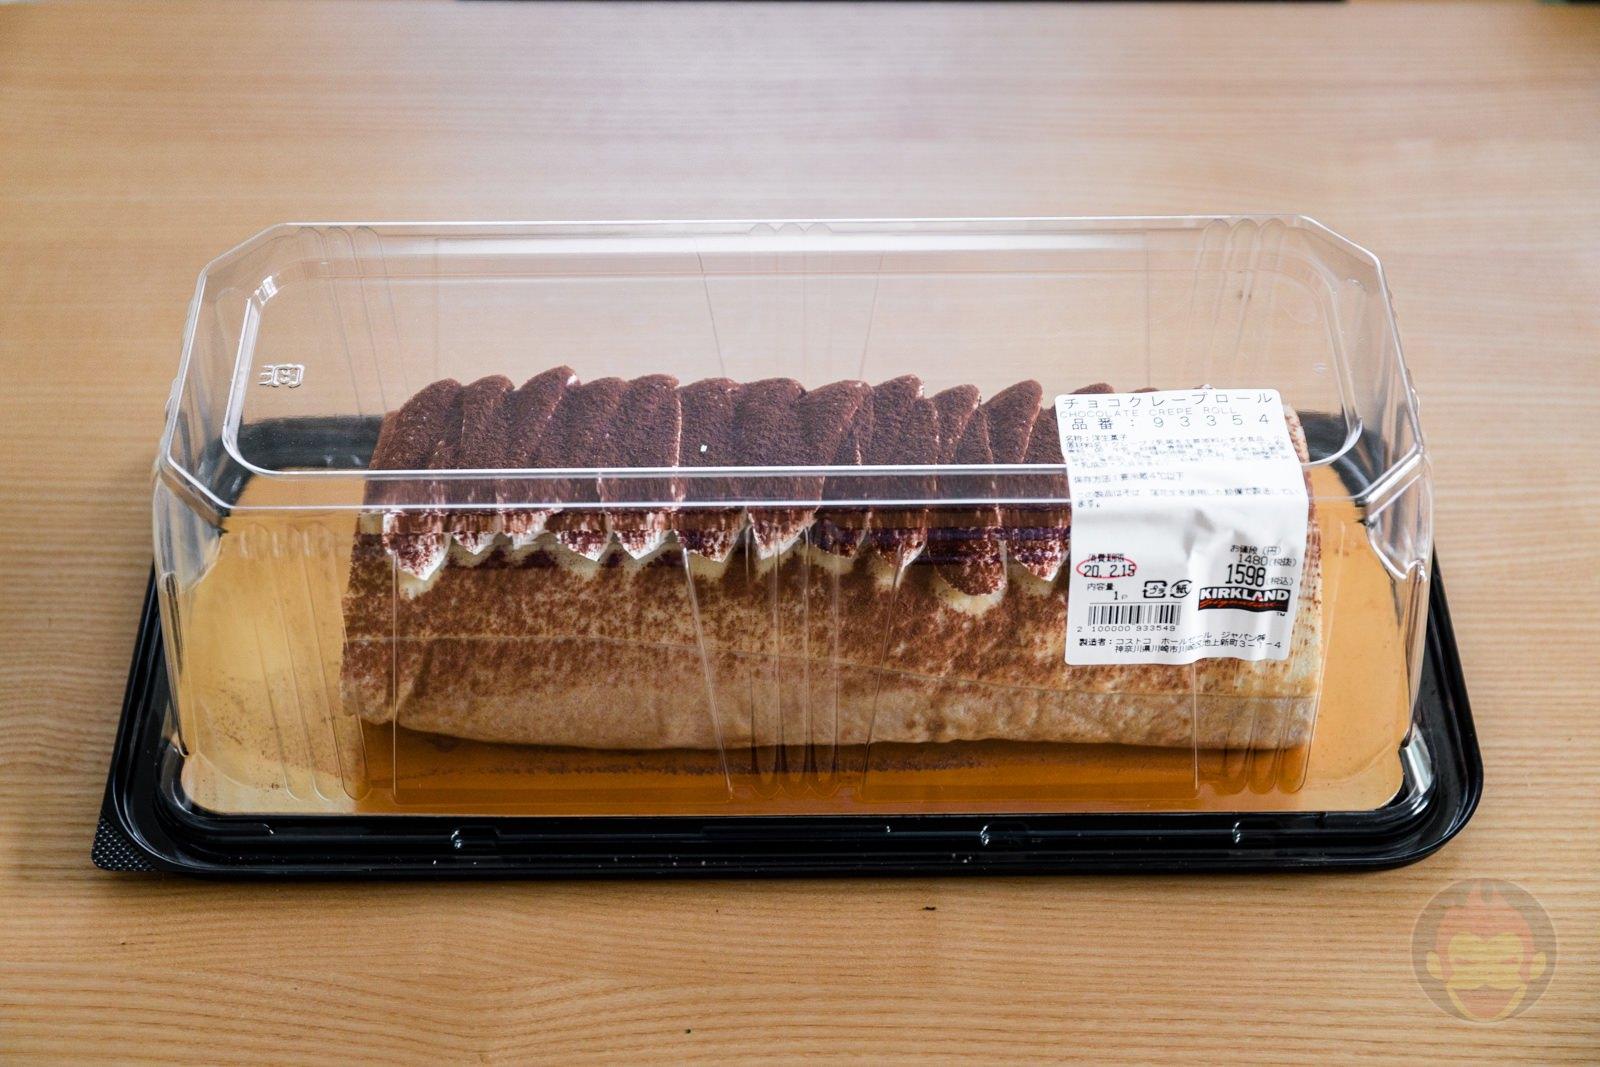 Chocolate-Crape-Roll-Costco-Dessert-11.jpg